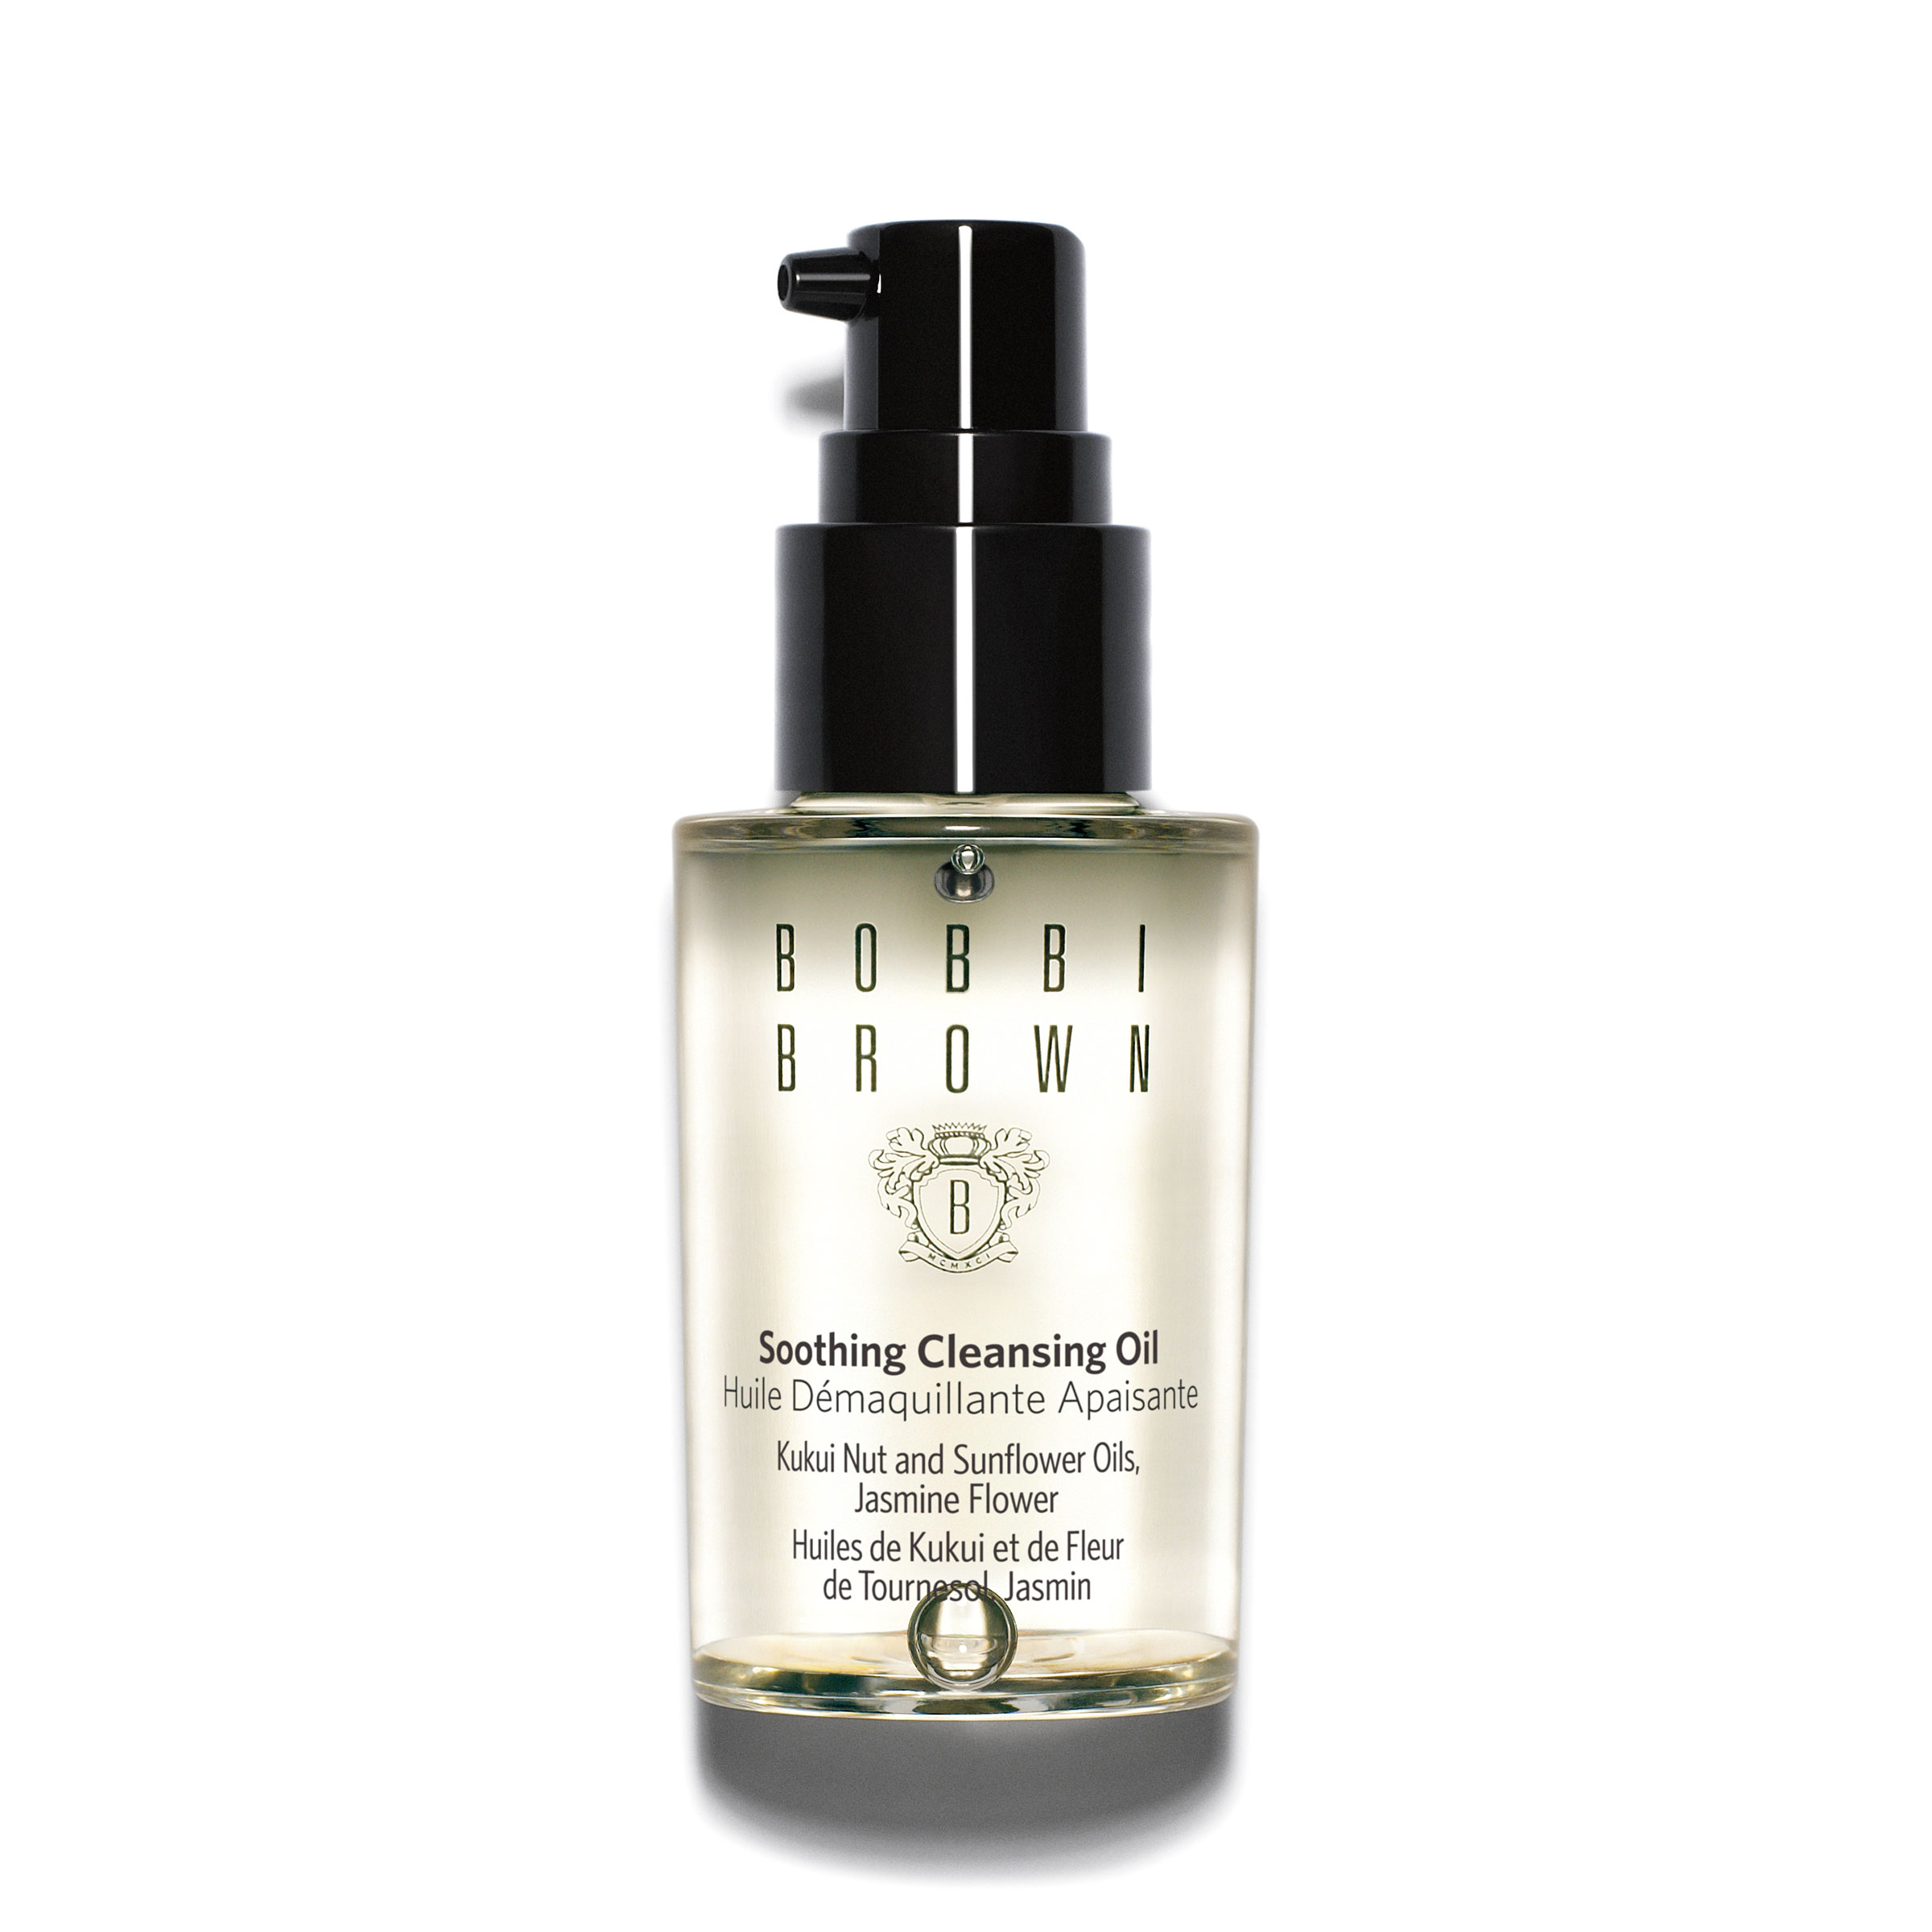 B BROWN Soothing Cleansing Oil Face cleansing gel:0139ml